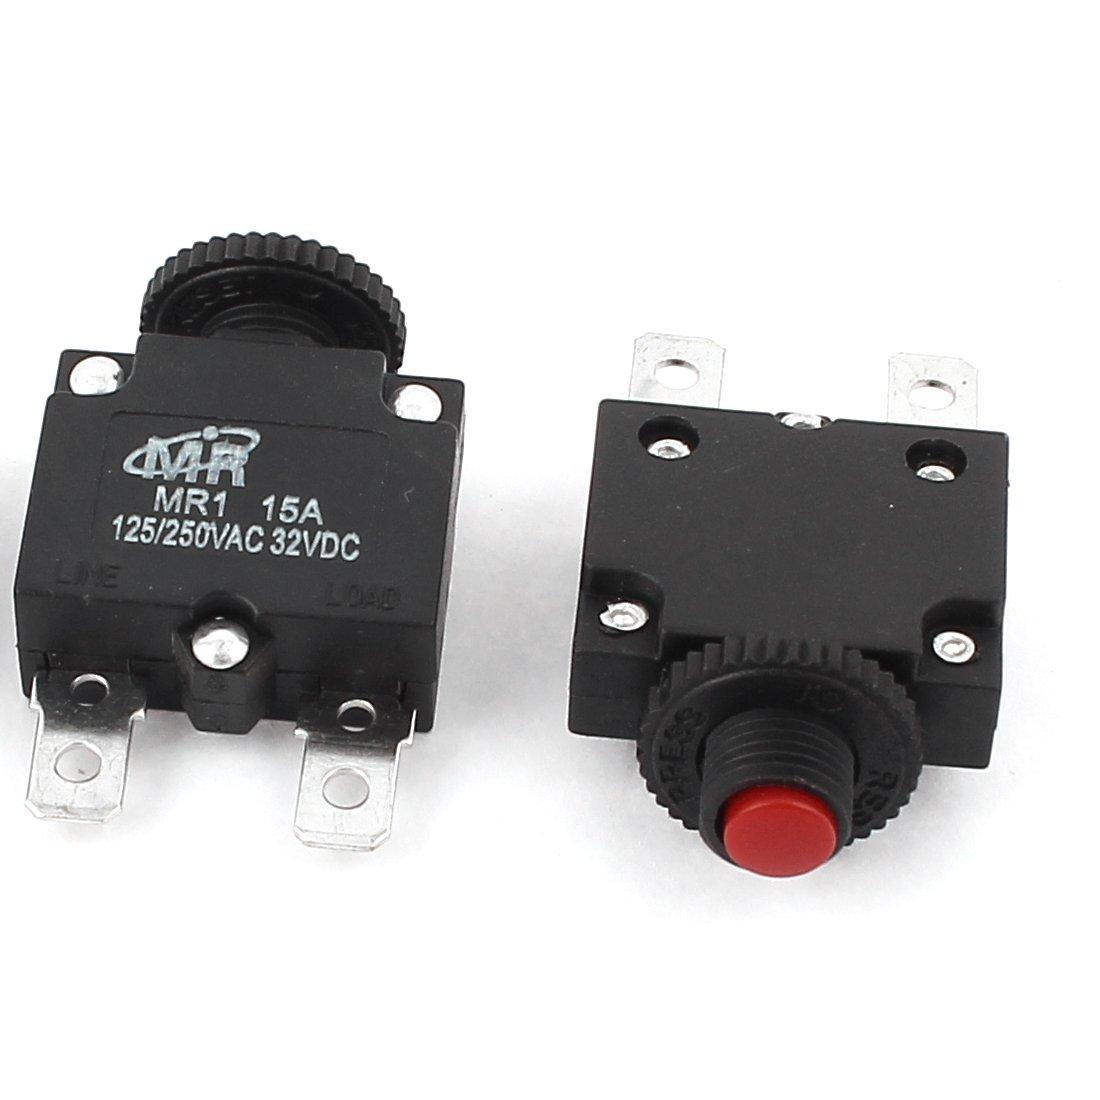 Dc 32v Ac 125v 250v 15a Push Button Reset Circuit Breaker Black 3pcs Types Video Different Of Breakers Ehow